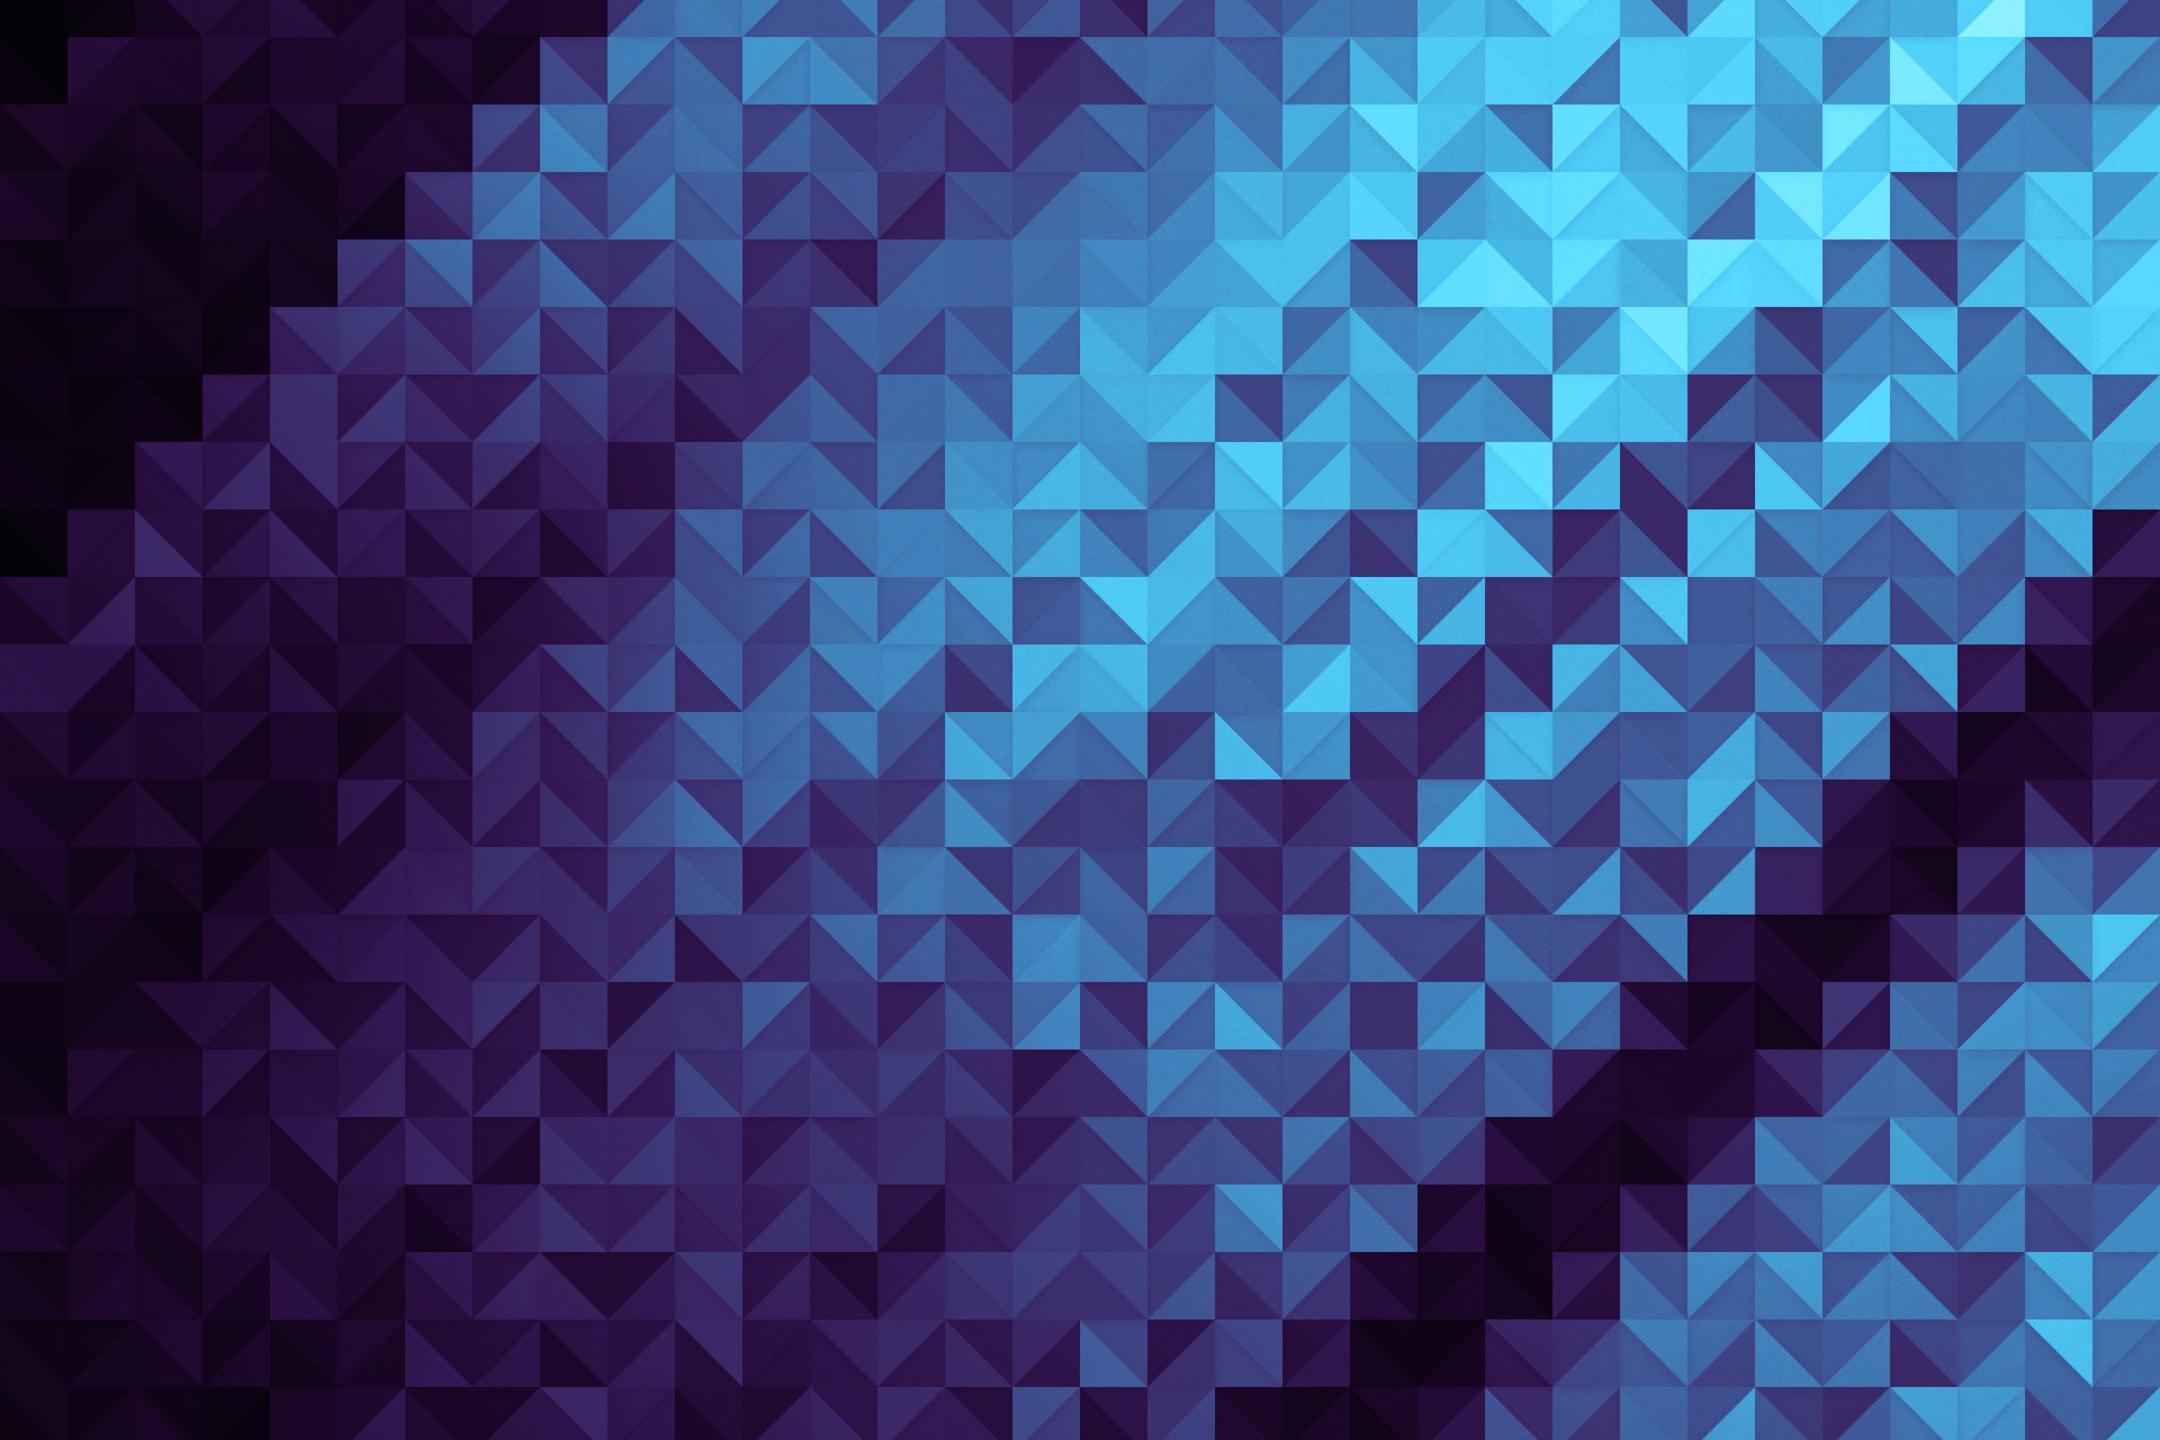 21601440 Wallpaper 00608 PCnet 2160x1440